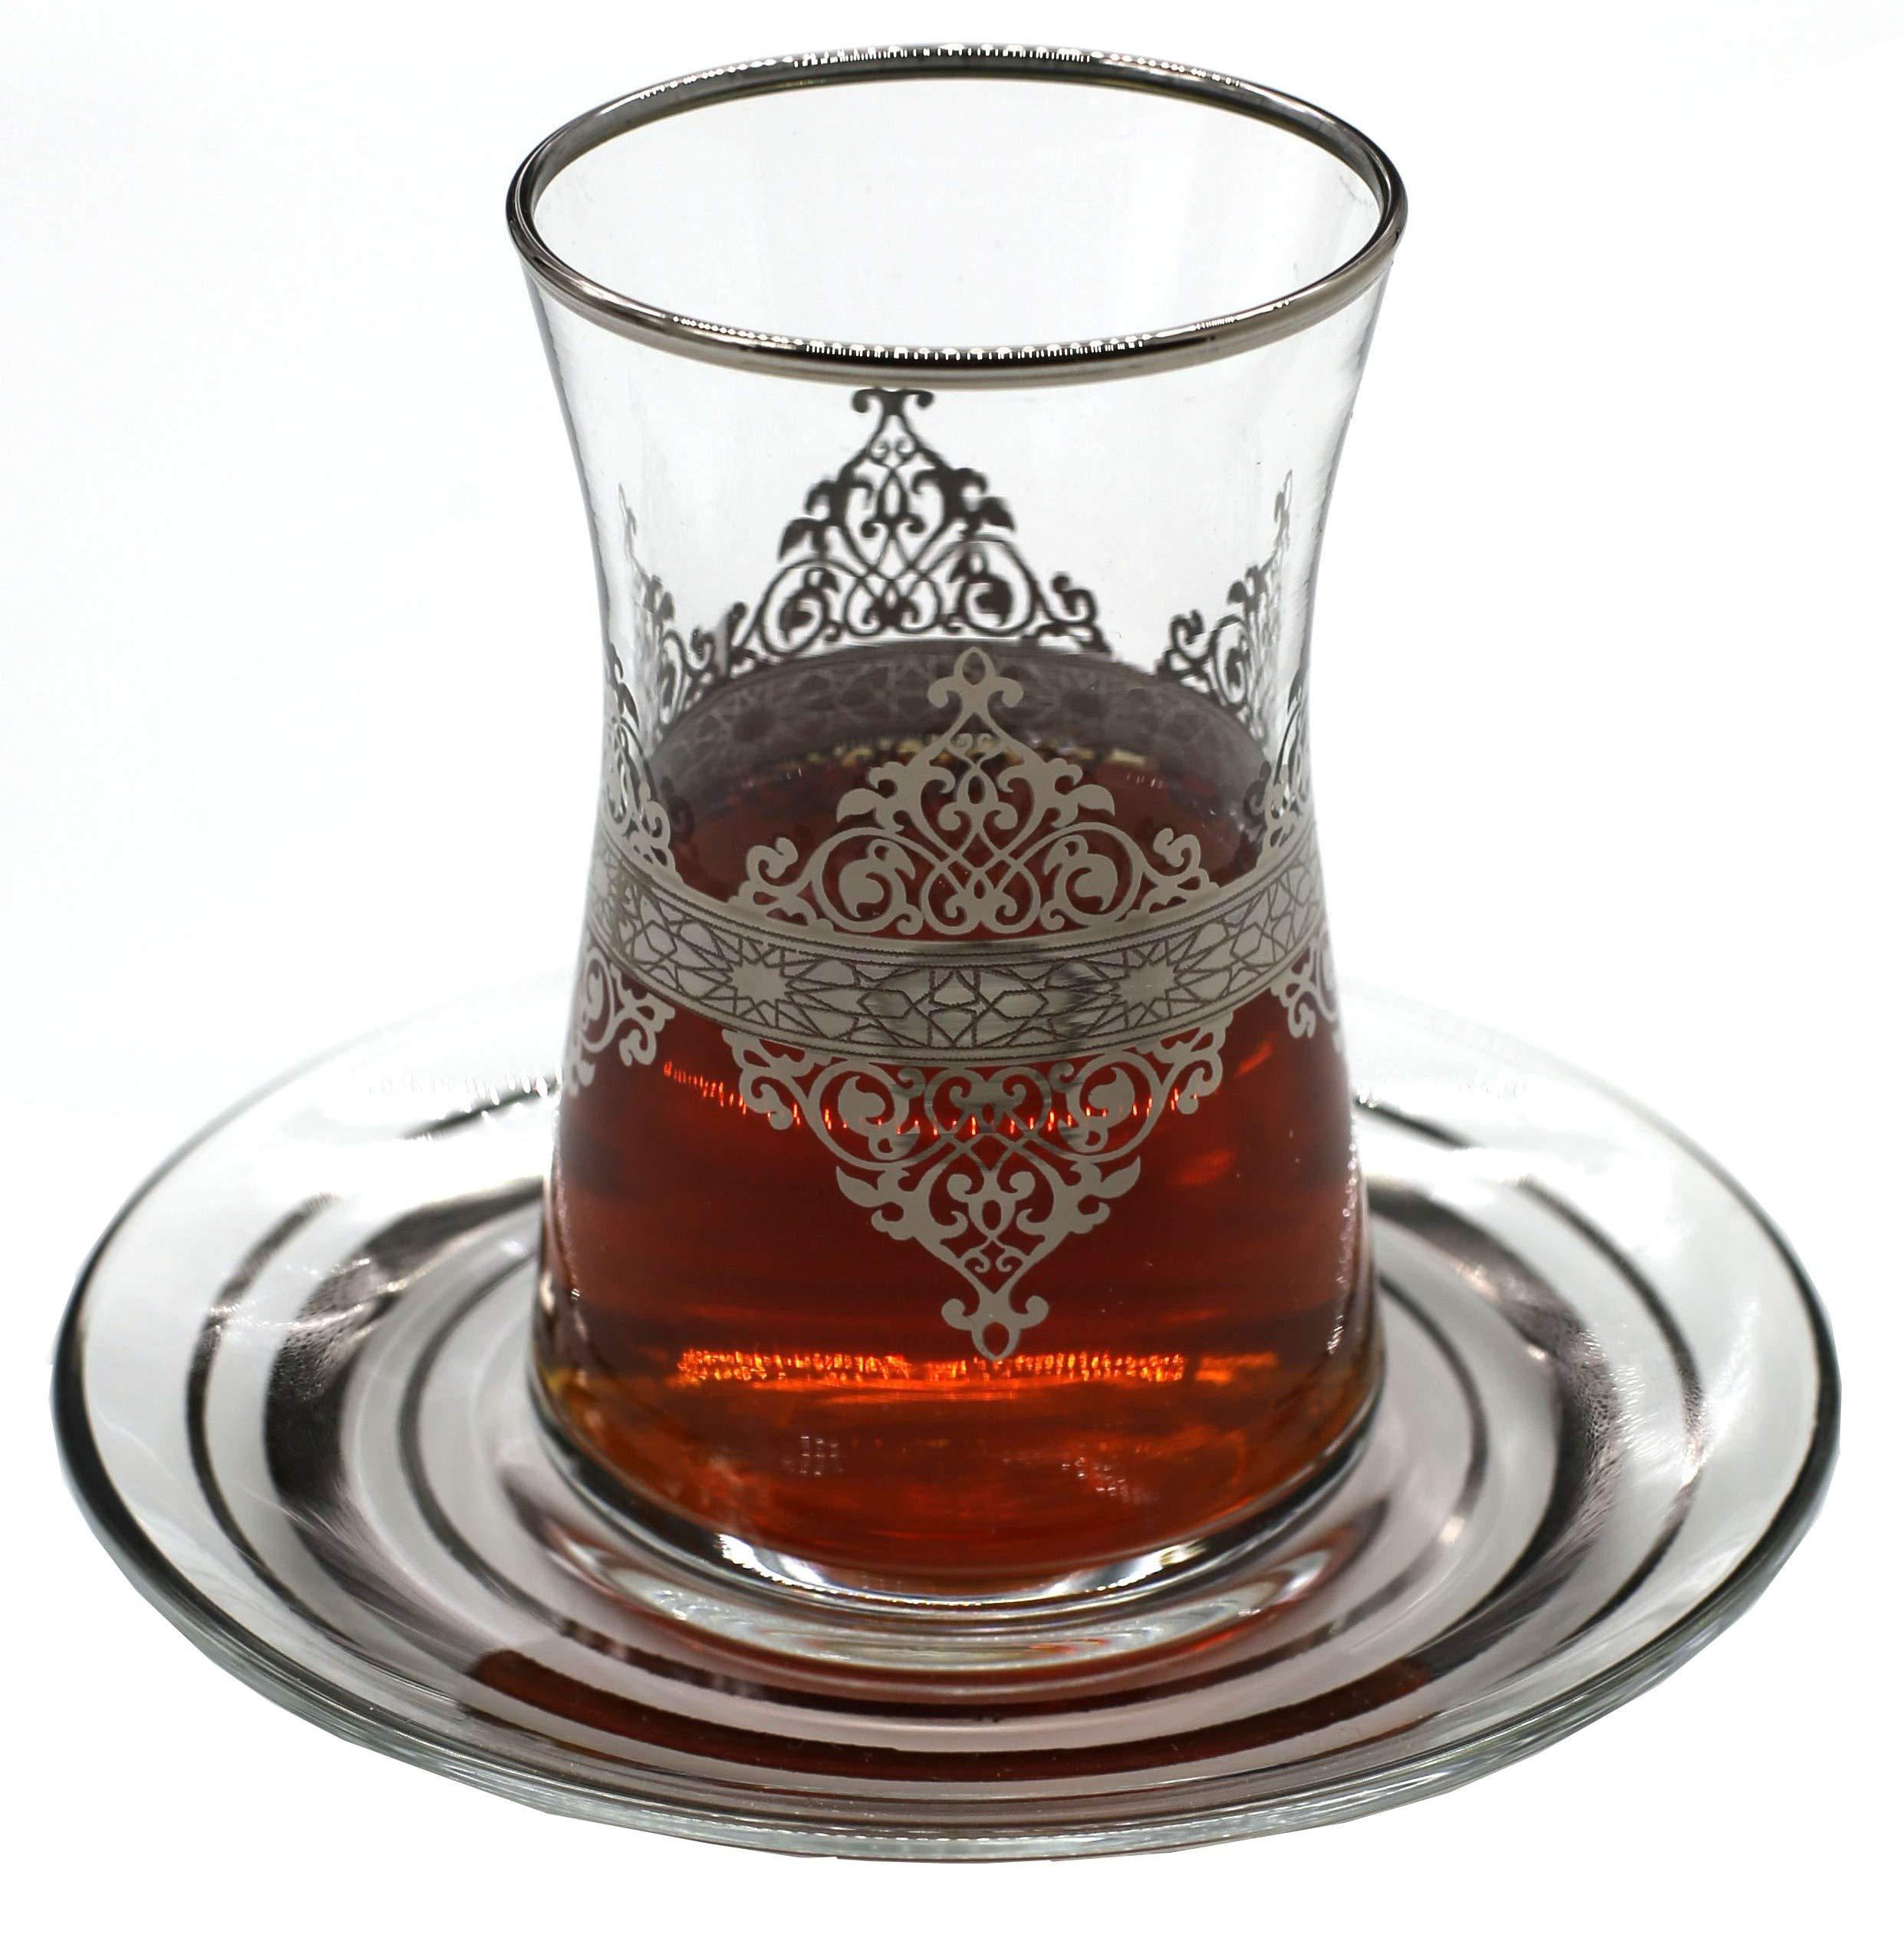 Nida Platinum Turkish Tea Glasses with Saucers Set (Set of 6) 5 Ounces